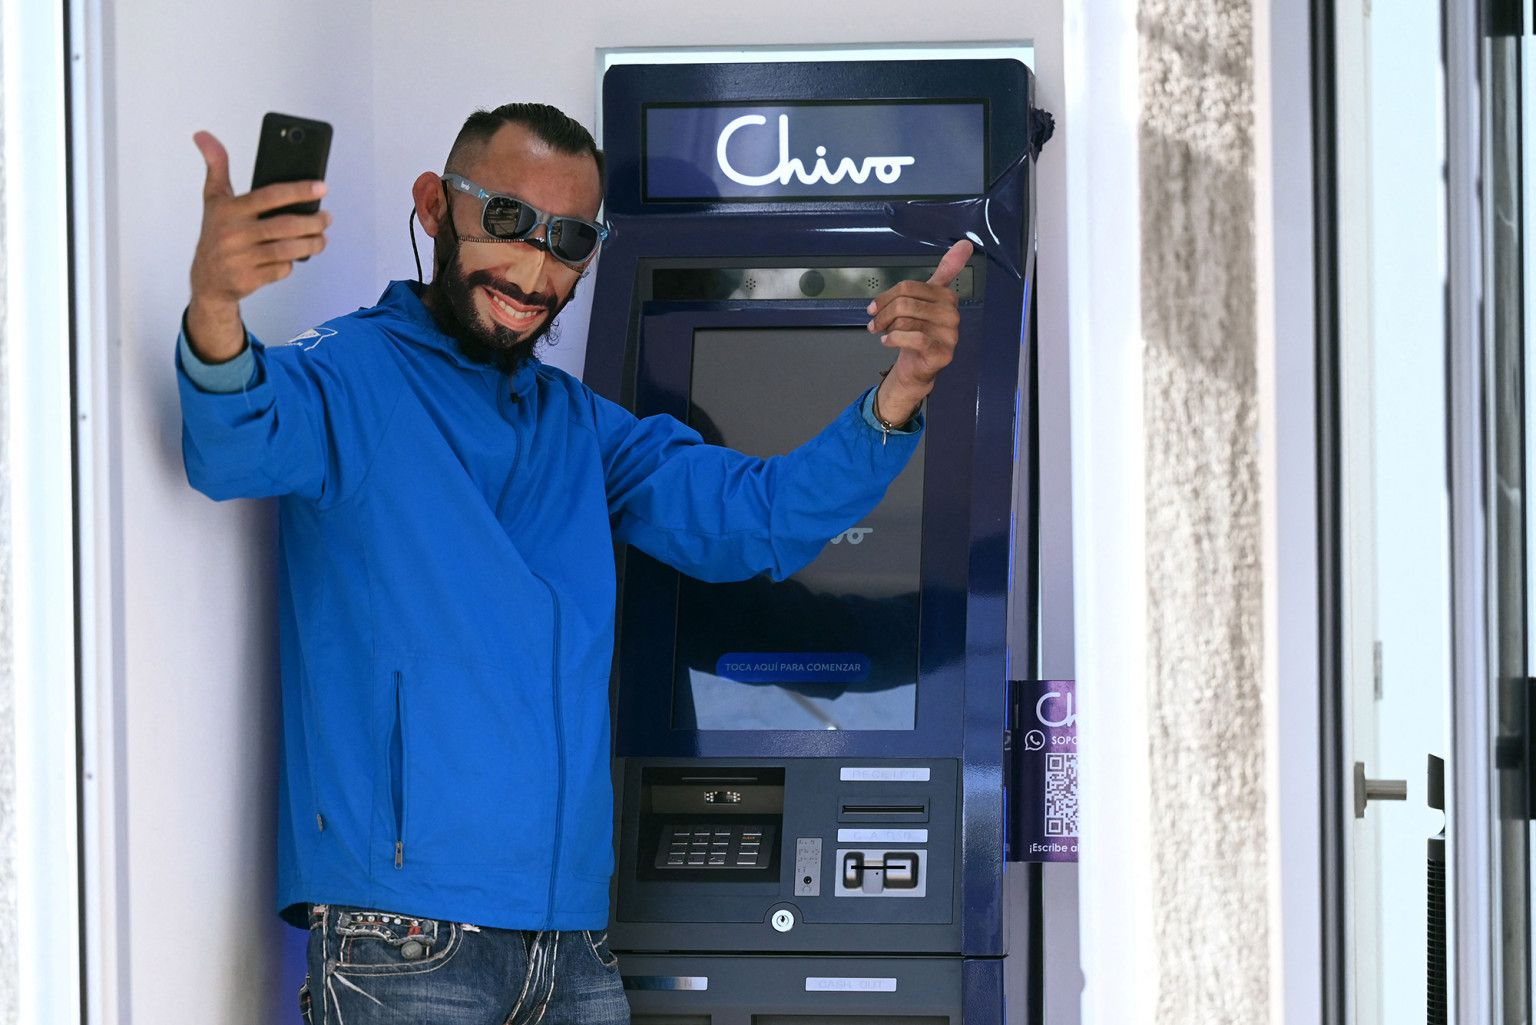 el-salvador-bitcoin-day-wiser-newsletter-rick-huckstep